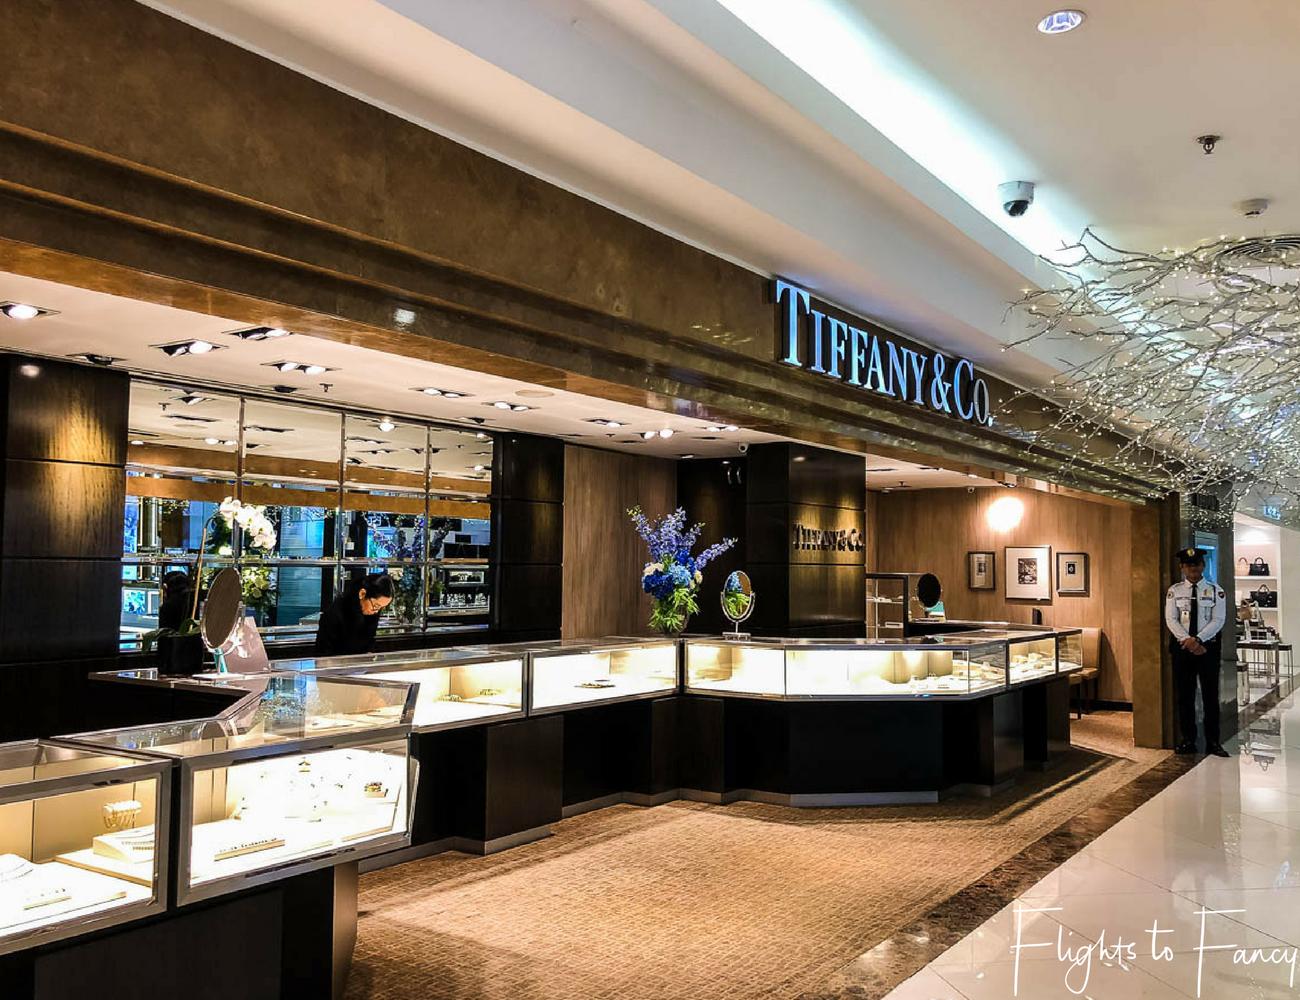 Flights to Fancy Makati Shopping Malls Glorietta Makati